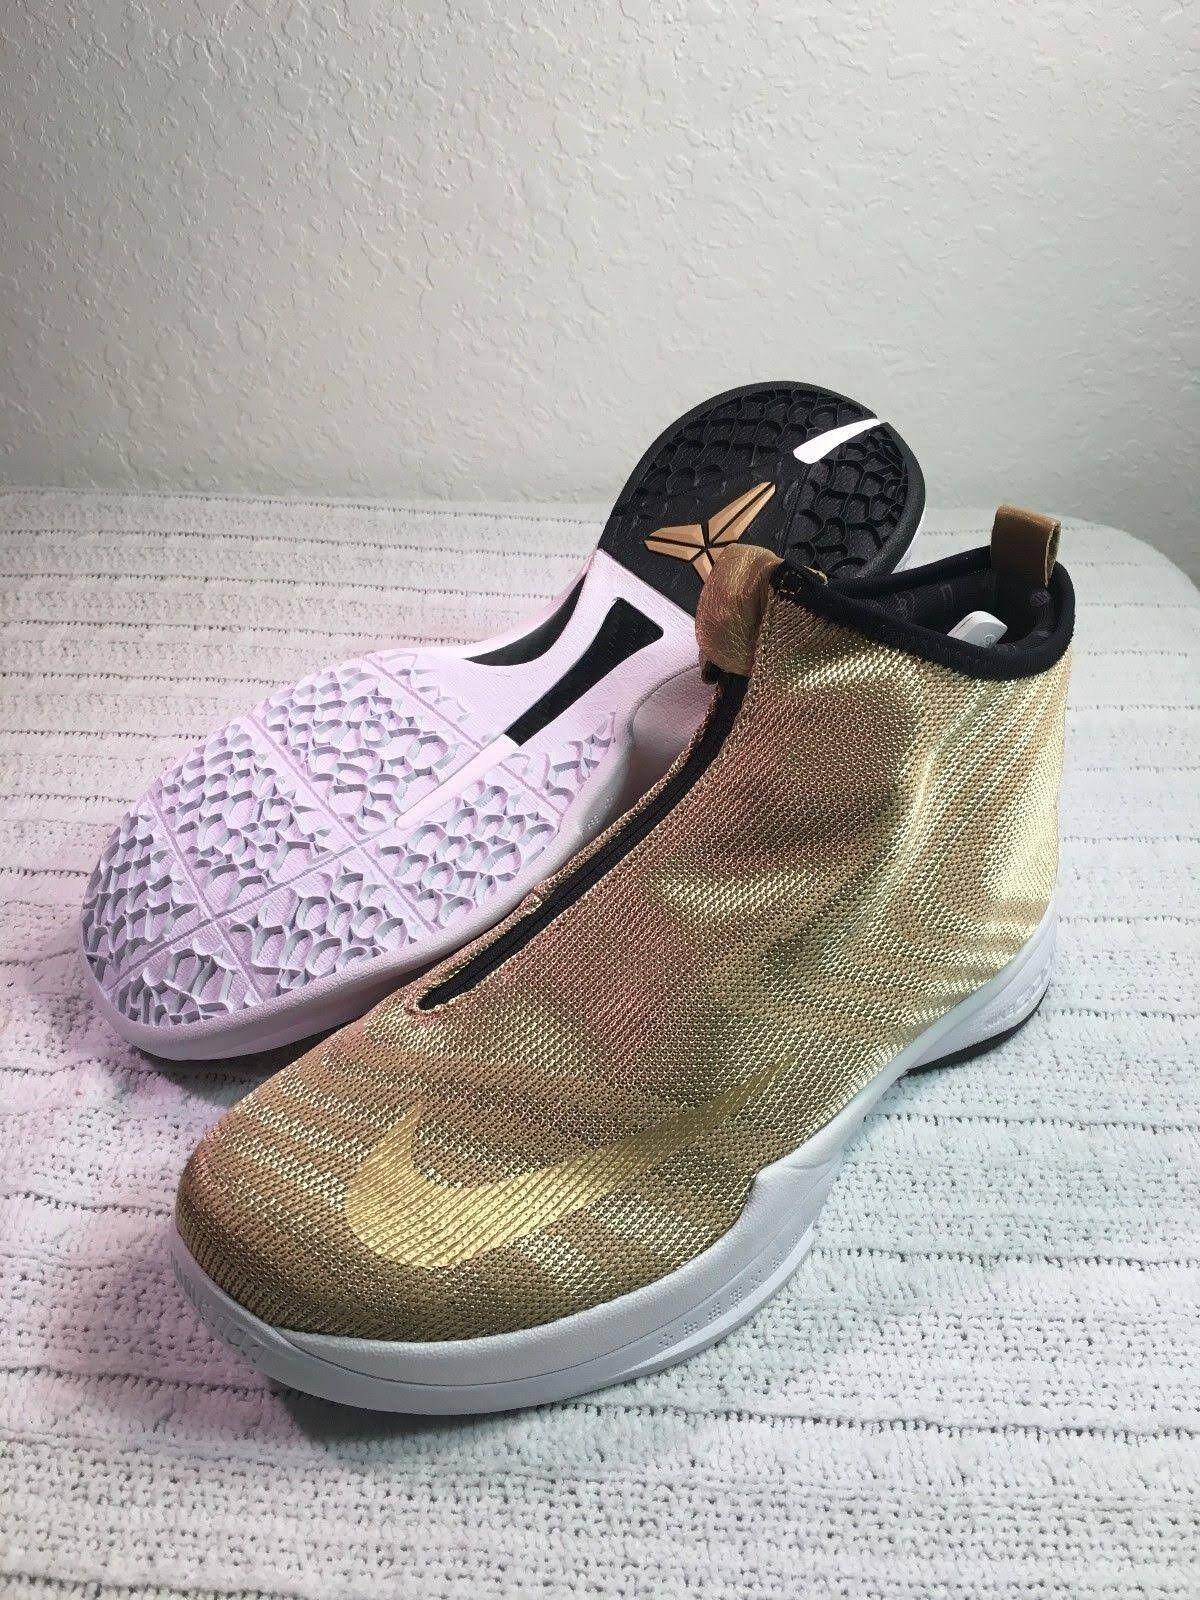 pretty nice 20190 779de NEW Nike Men s Met. Gold Black Zoom Kobe Kobe Kobe Icon Jacquard Basketball  Shoes sz 10.5 616237